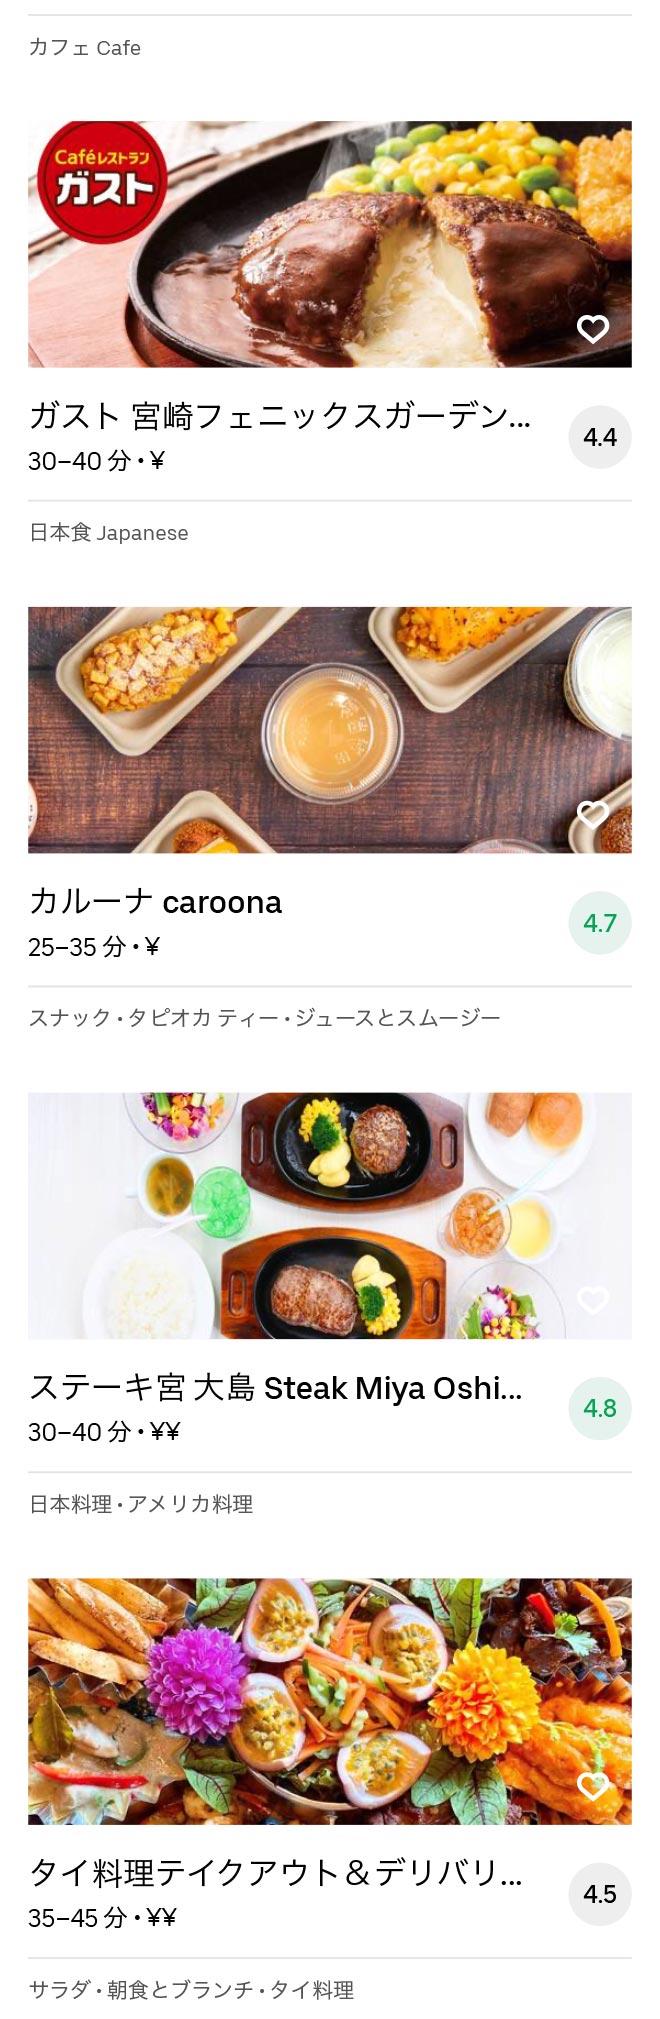 Miyazaki menu 2009 3